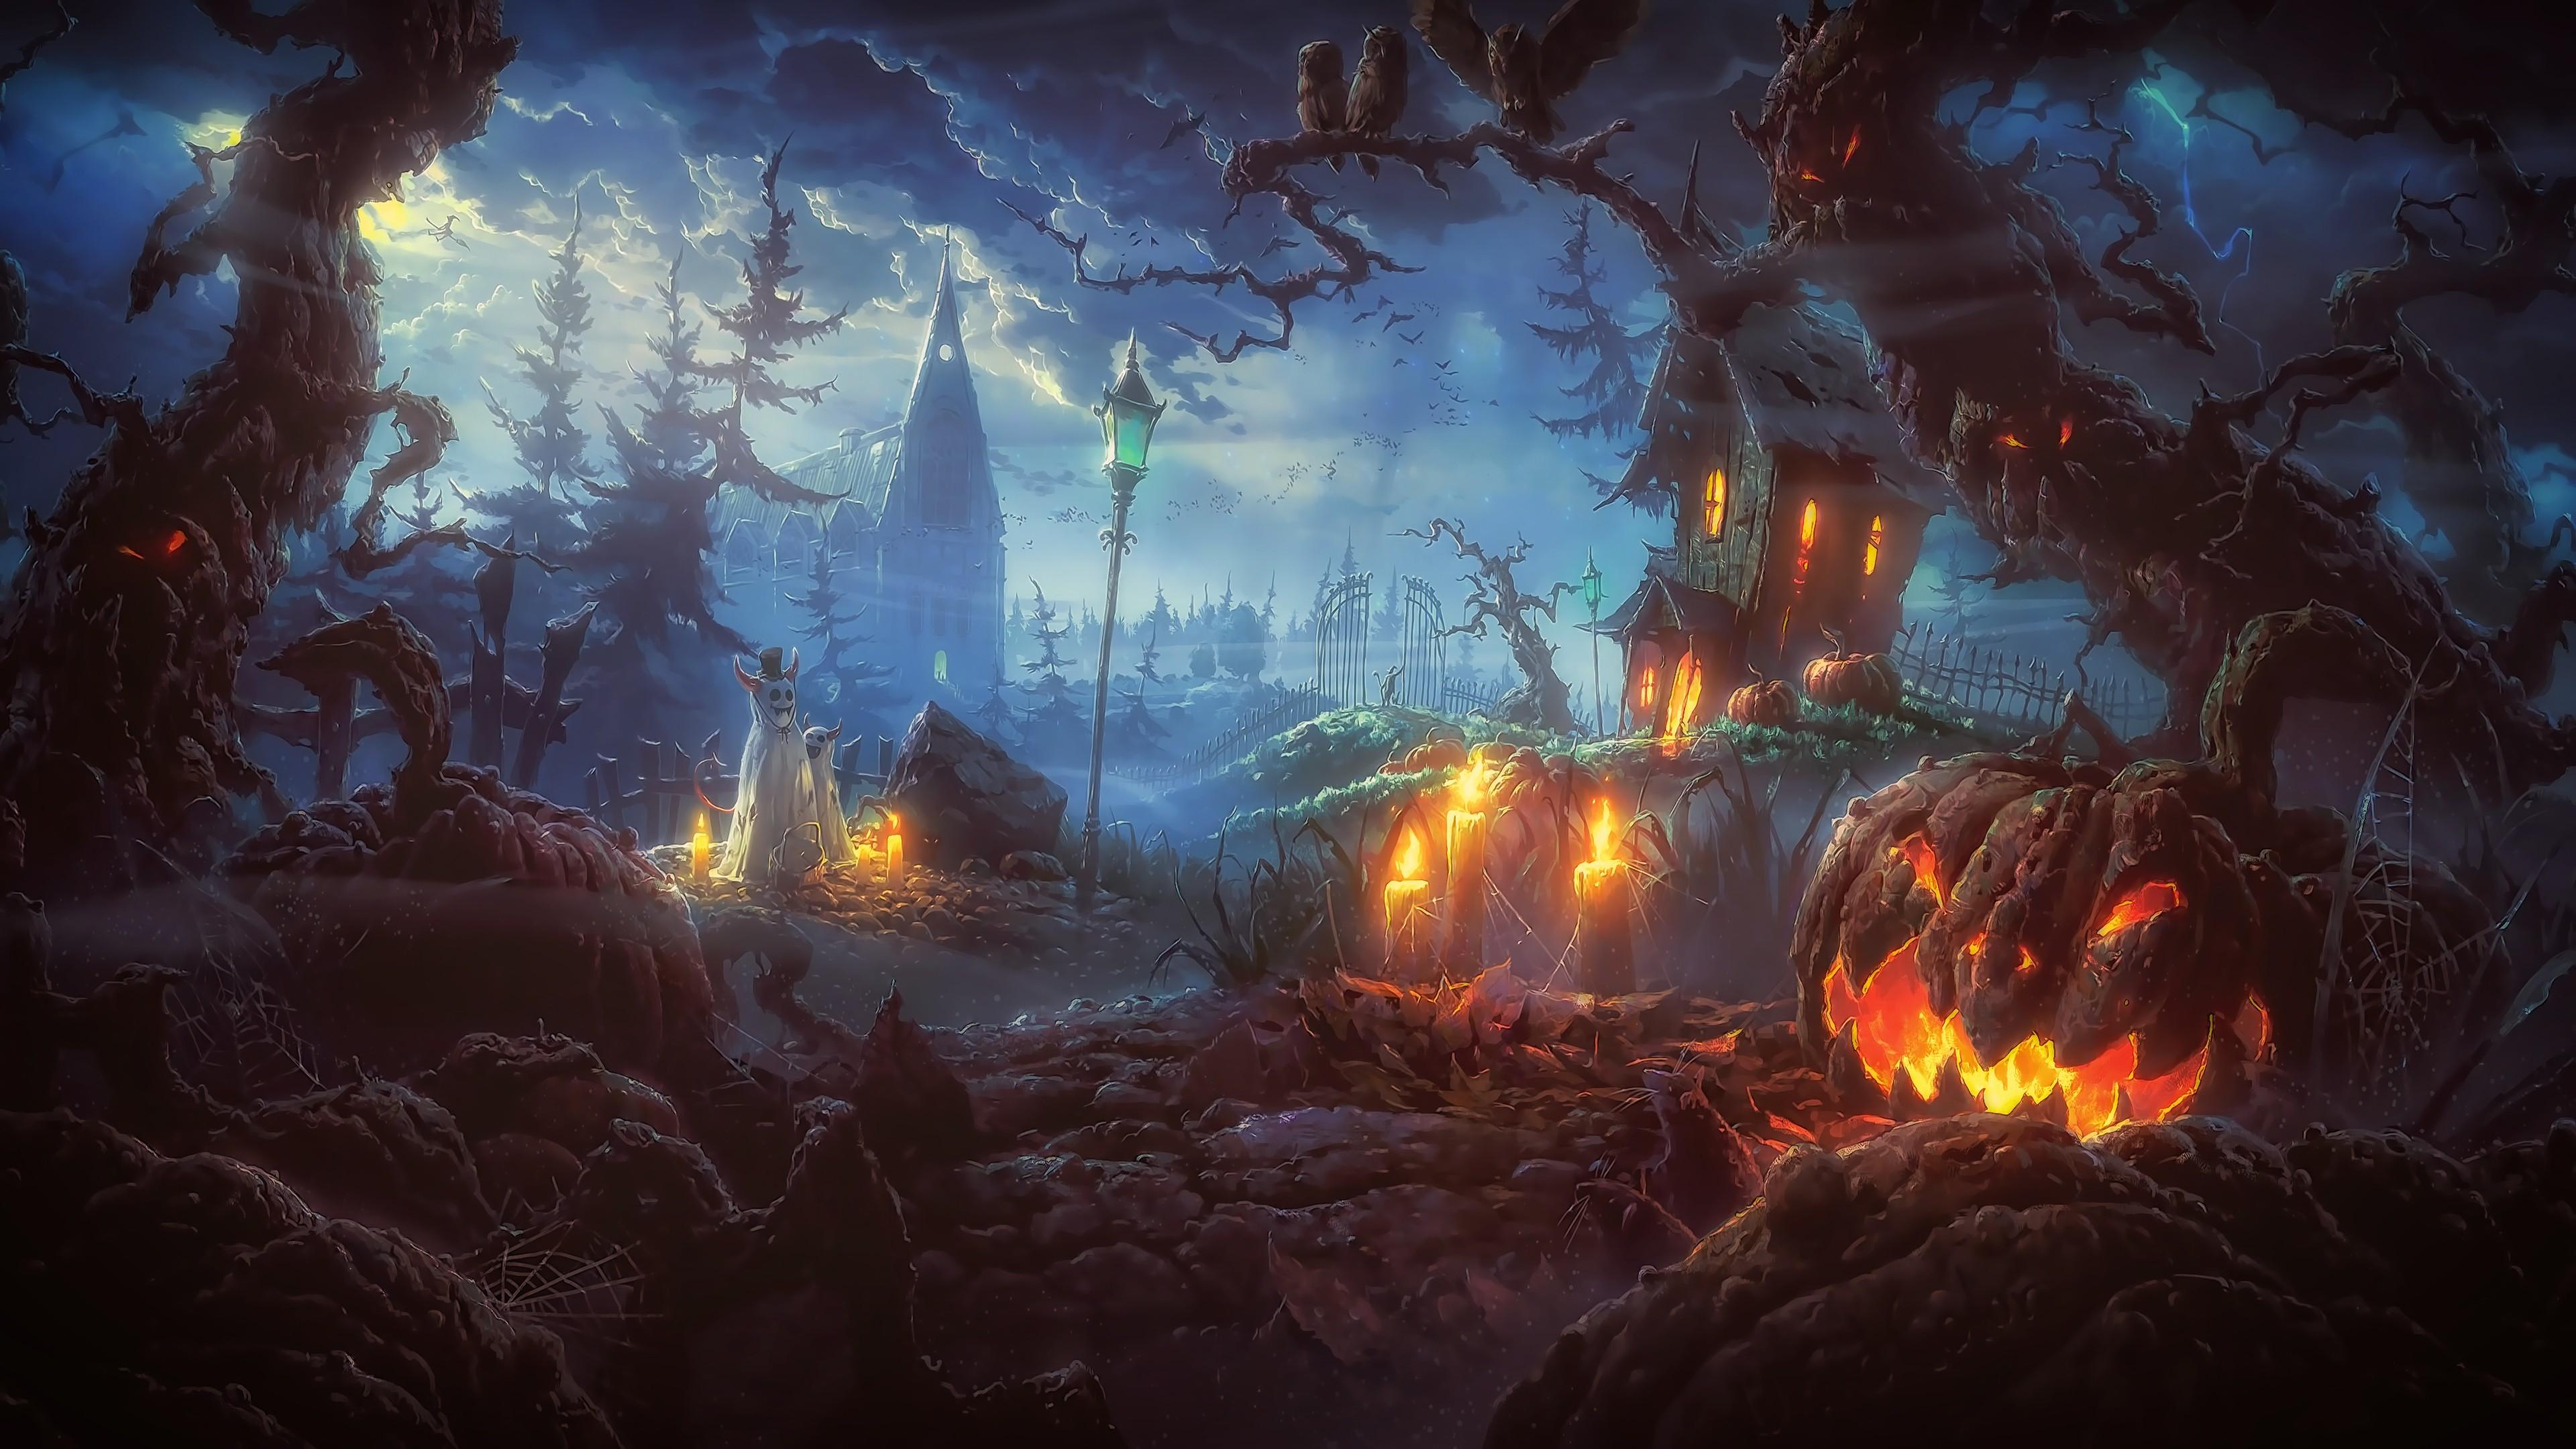 Scary halloween desktop backgrounds 62 pictures - Scary halloween wallpaper ...